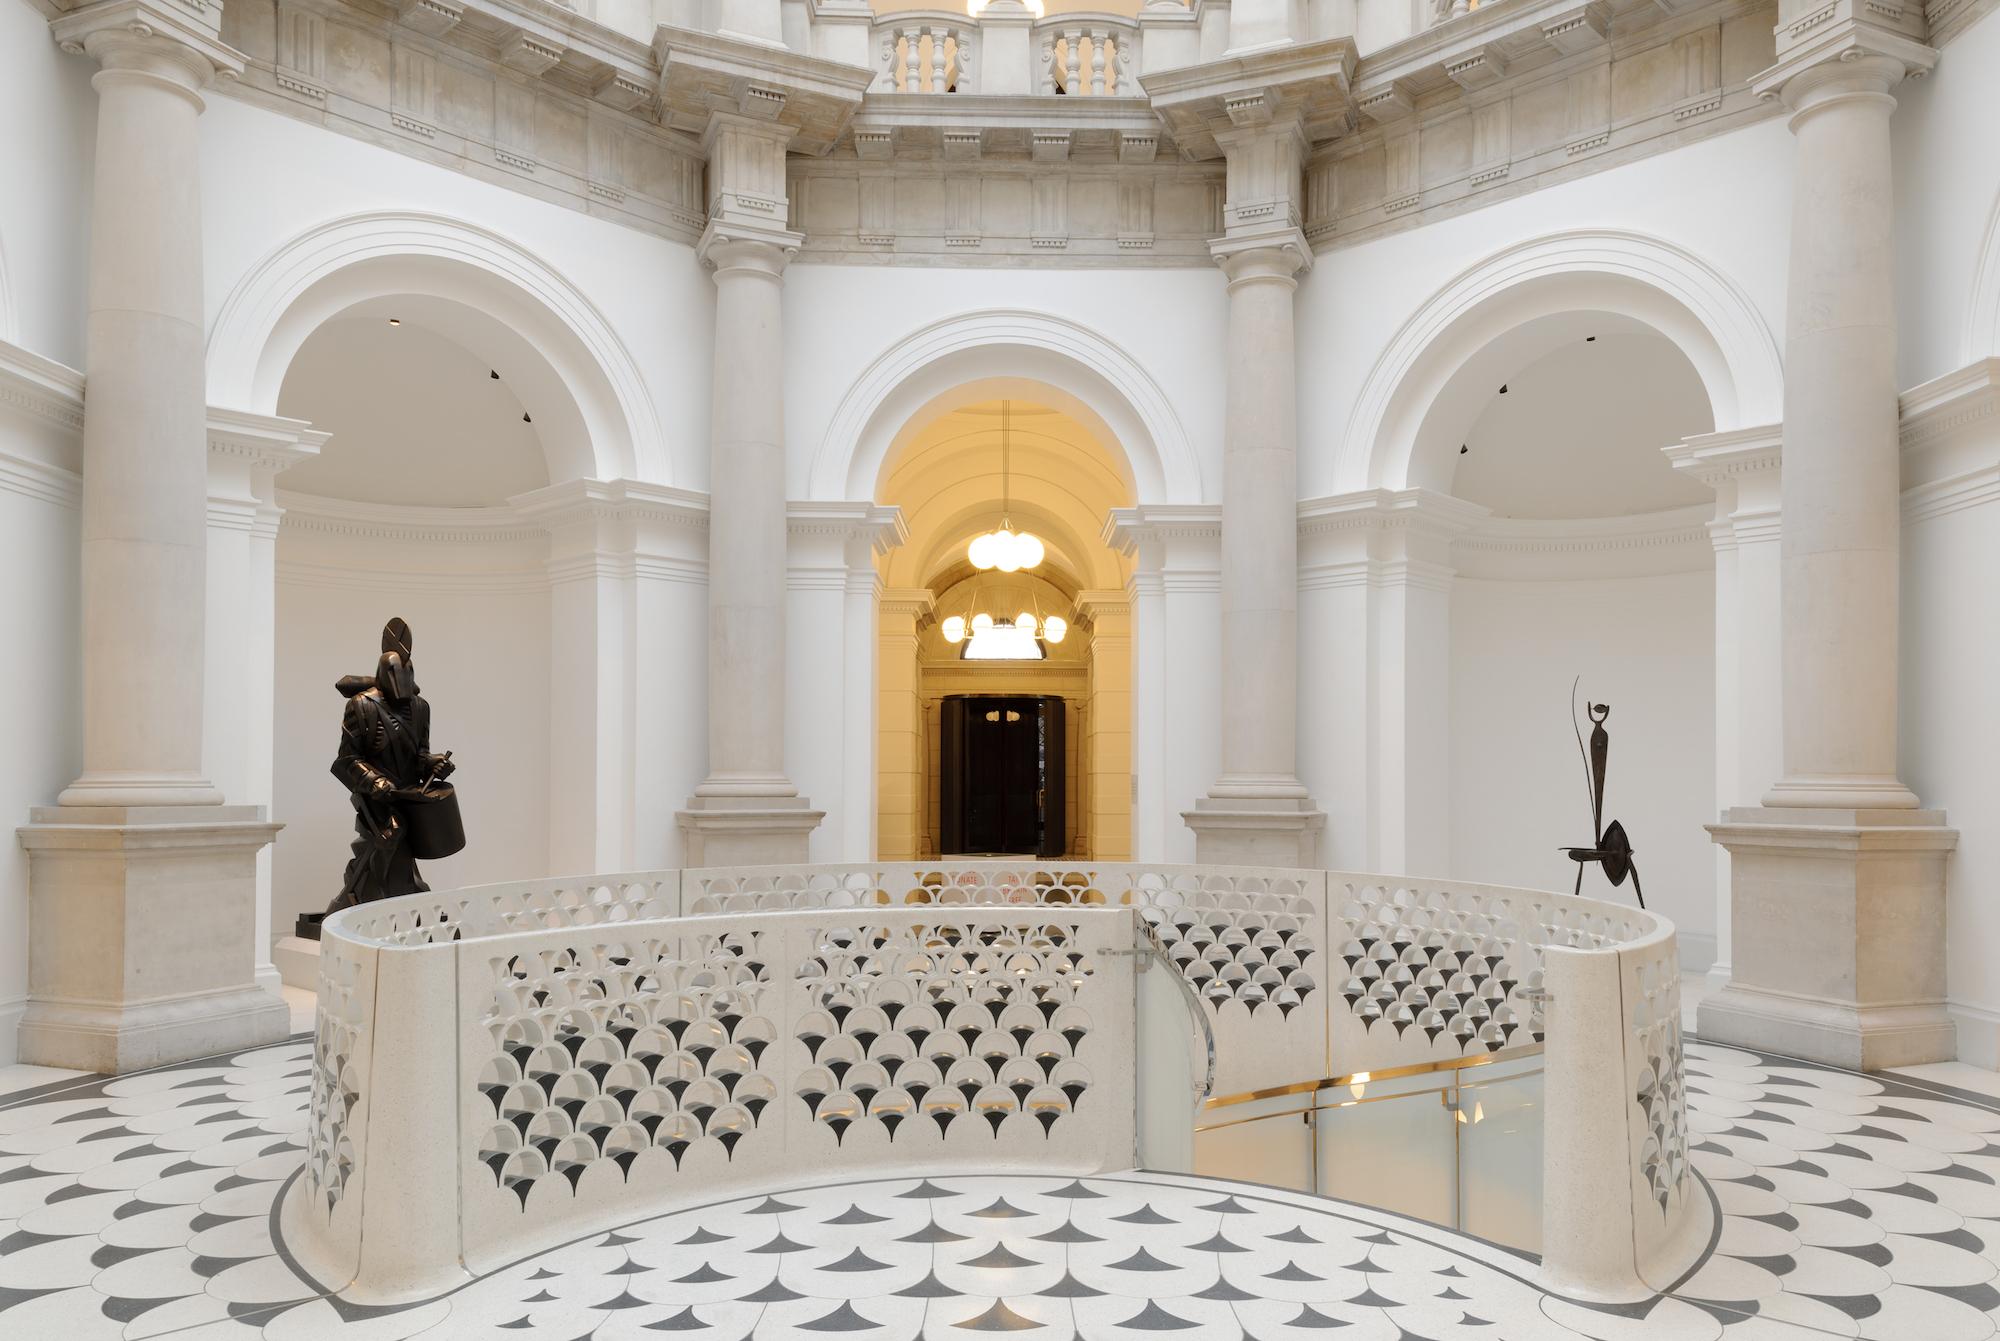 Tate Britain interior © Tate Photography